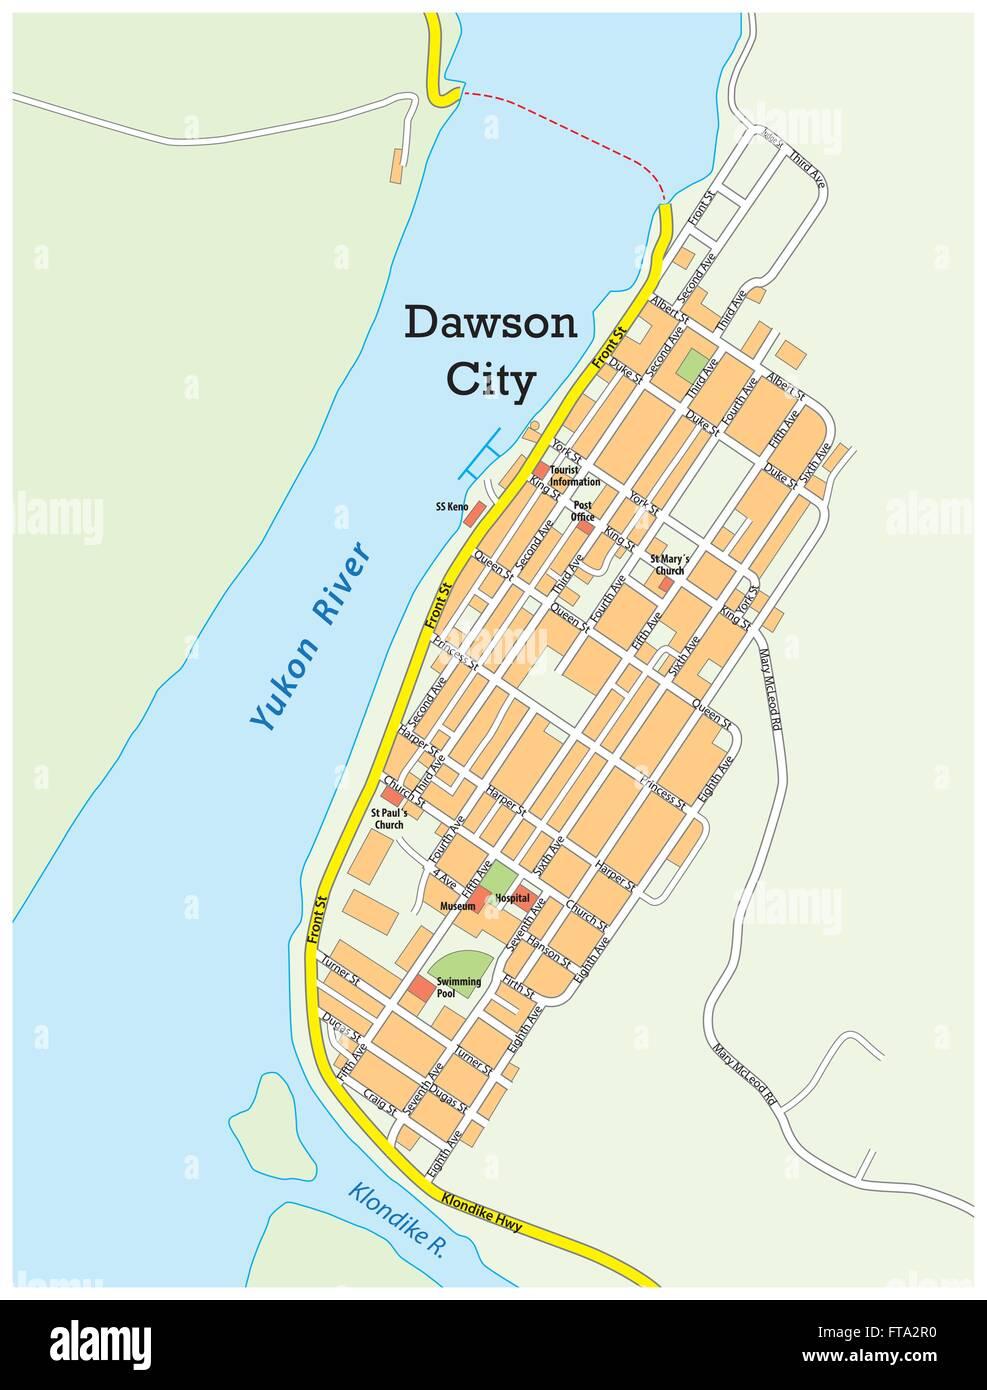 Map Of Dawson City Canada city map of dawson city yukon territory canada Stock Vector Image